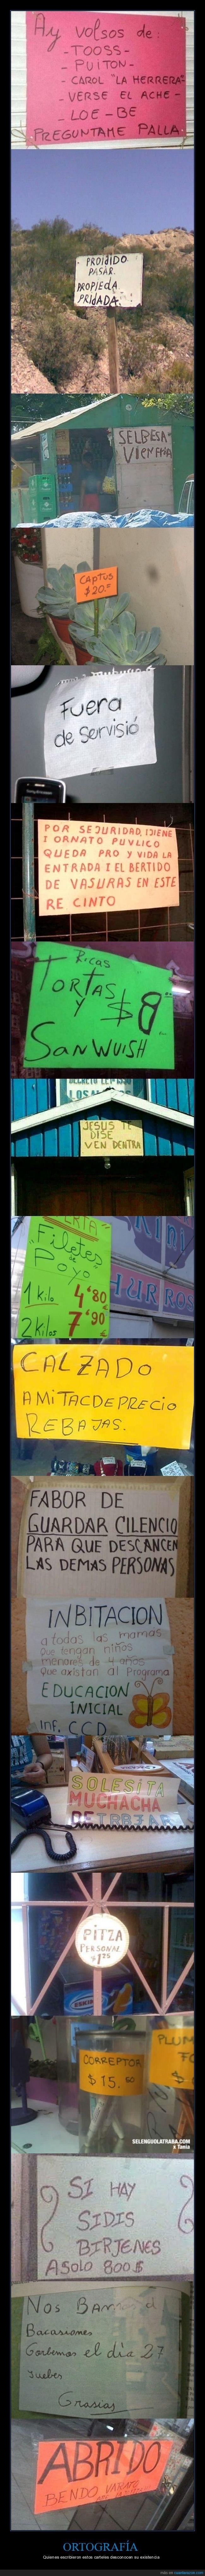 carteles,fails,ortografía